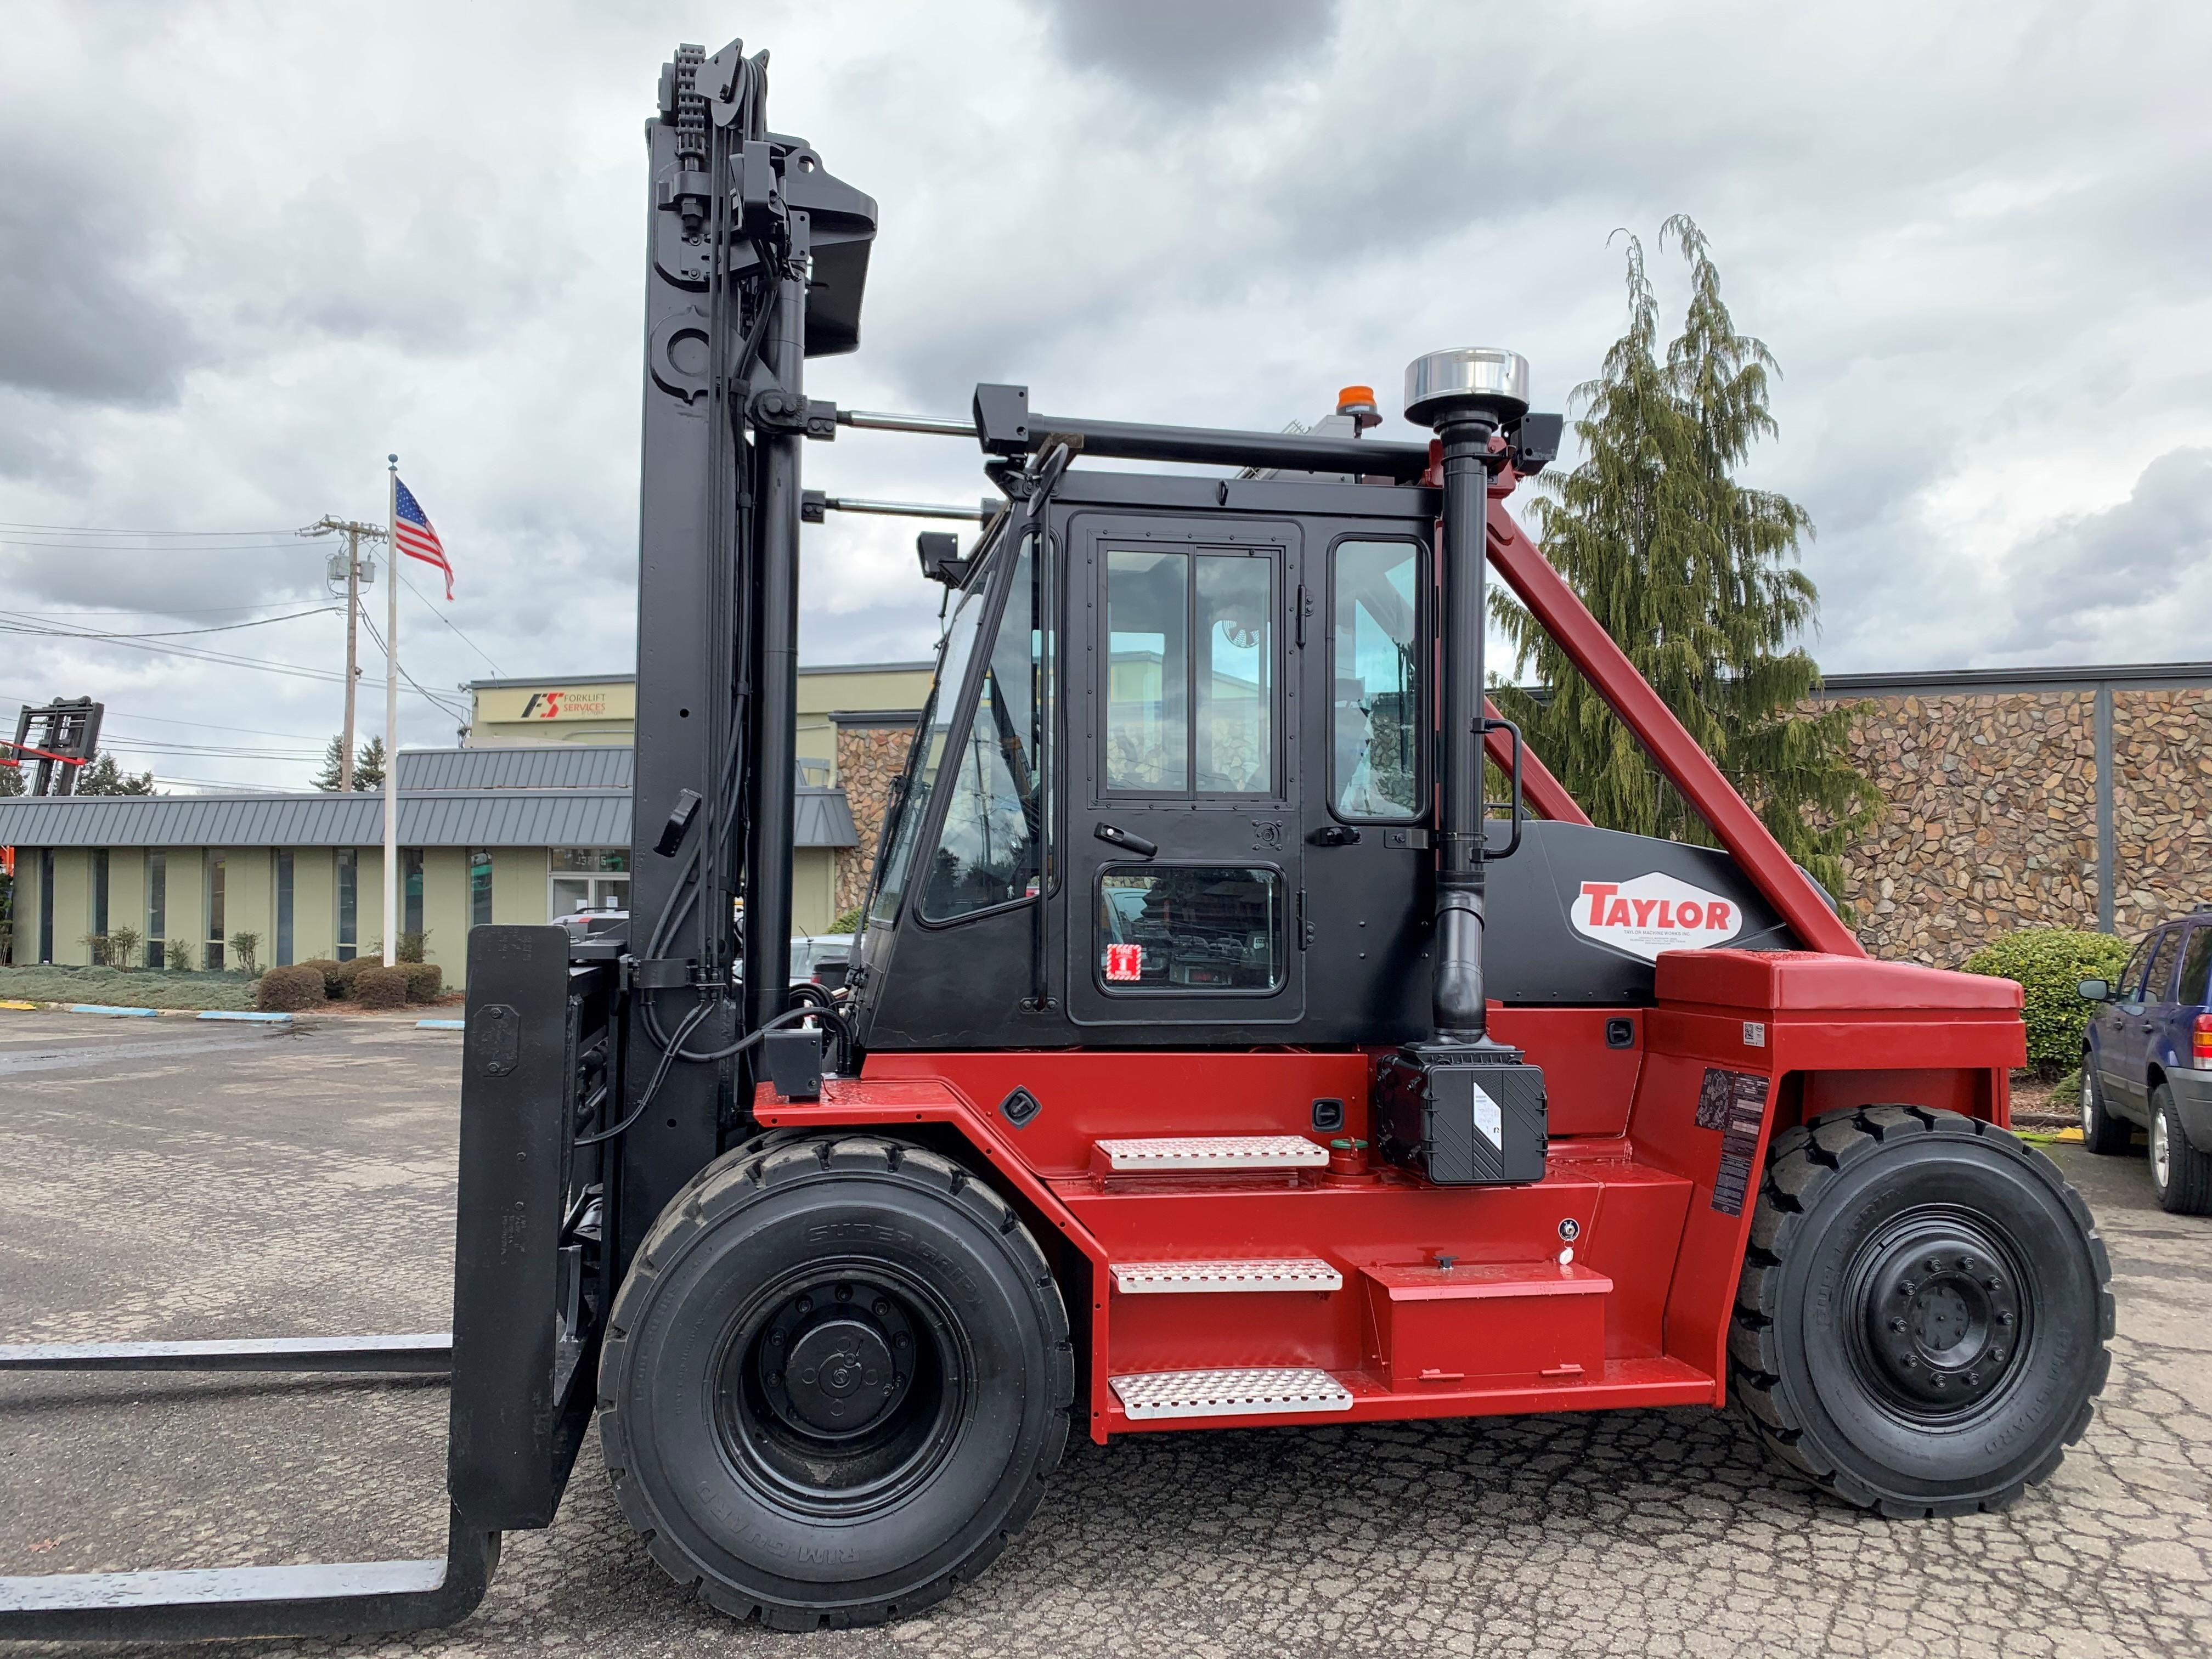 Used, 2015, Taylor, TX-300M, Forklifts / Lift Trucks